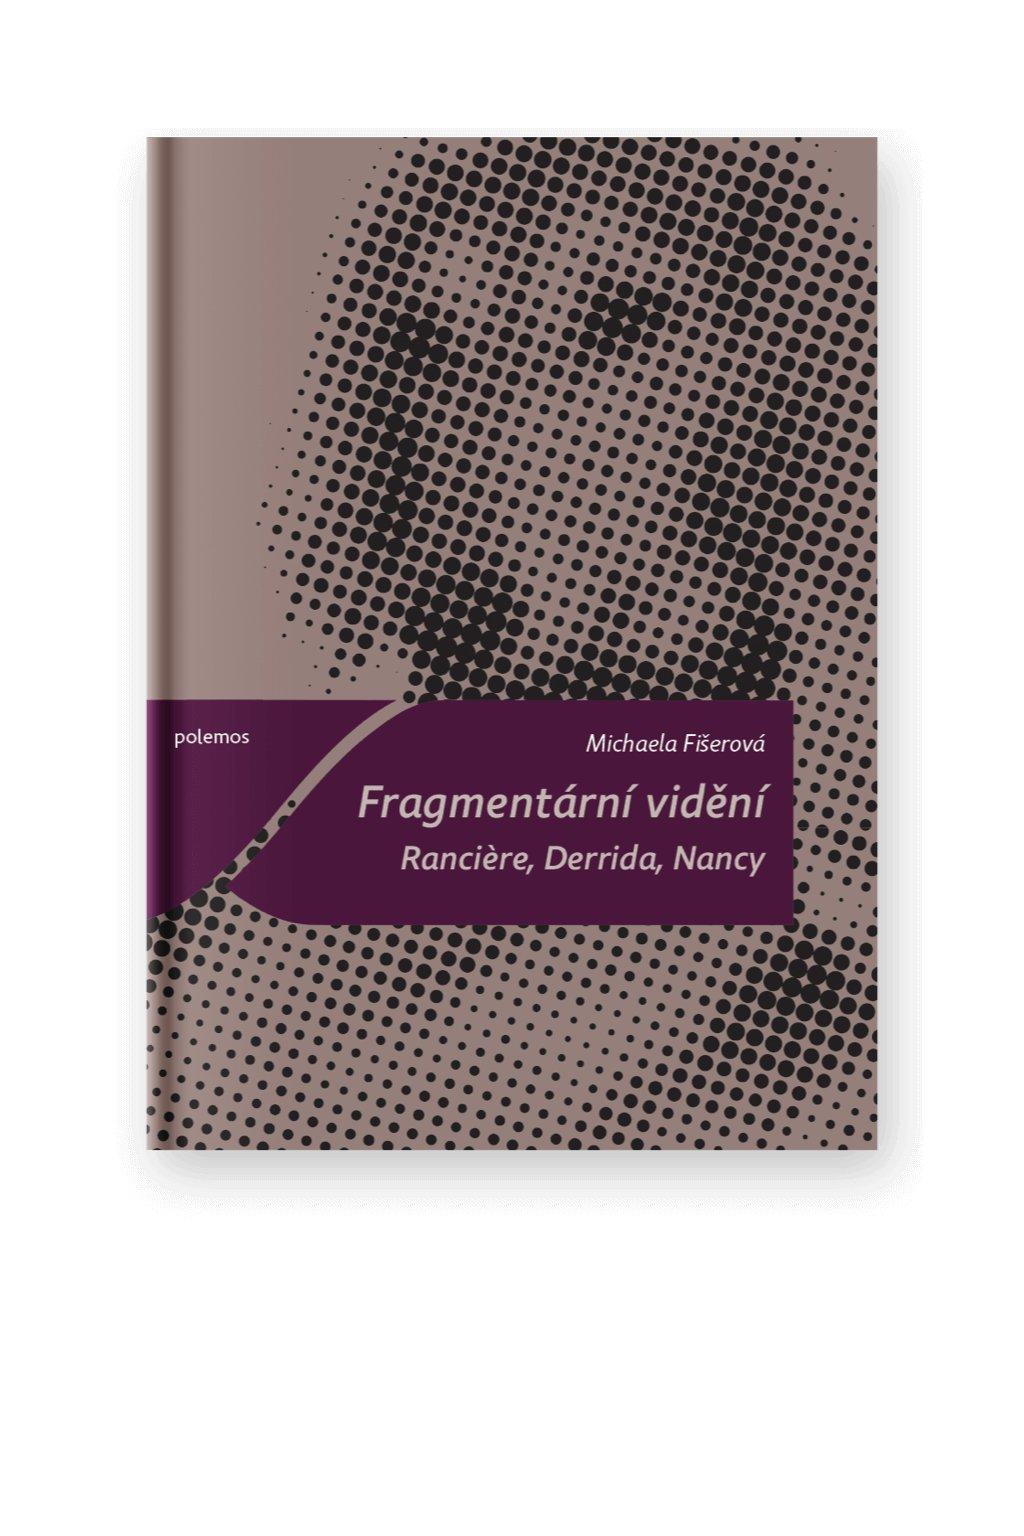 1334 fragmentarni videni